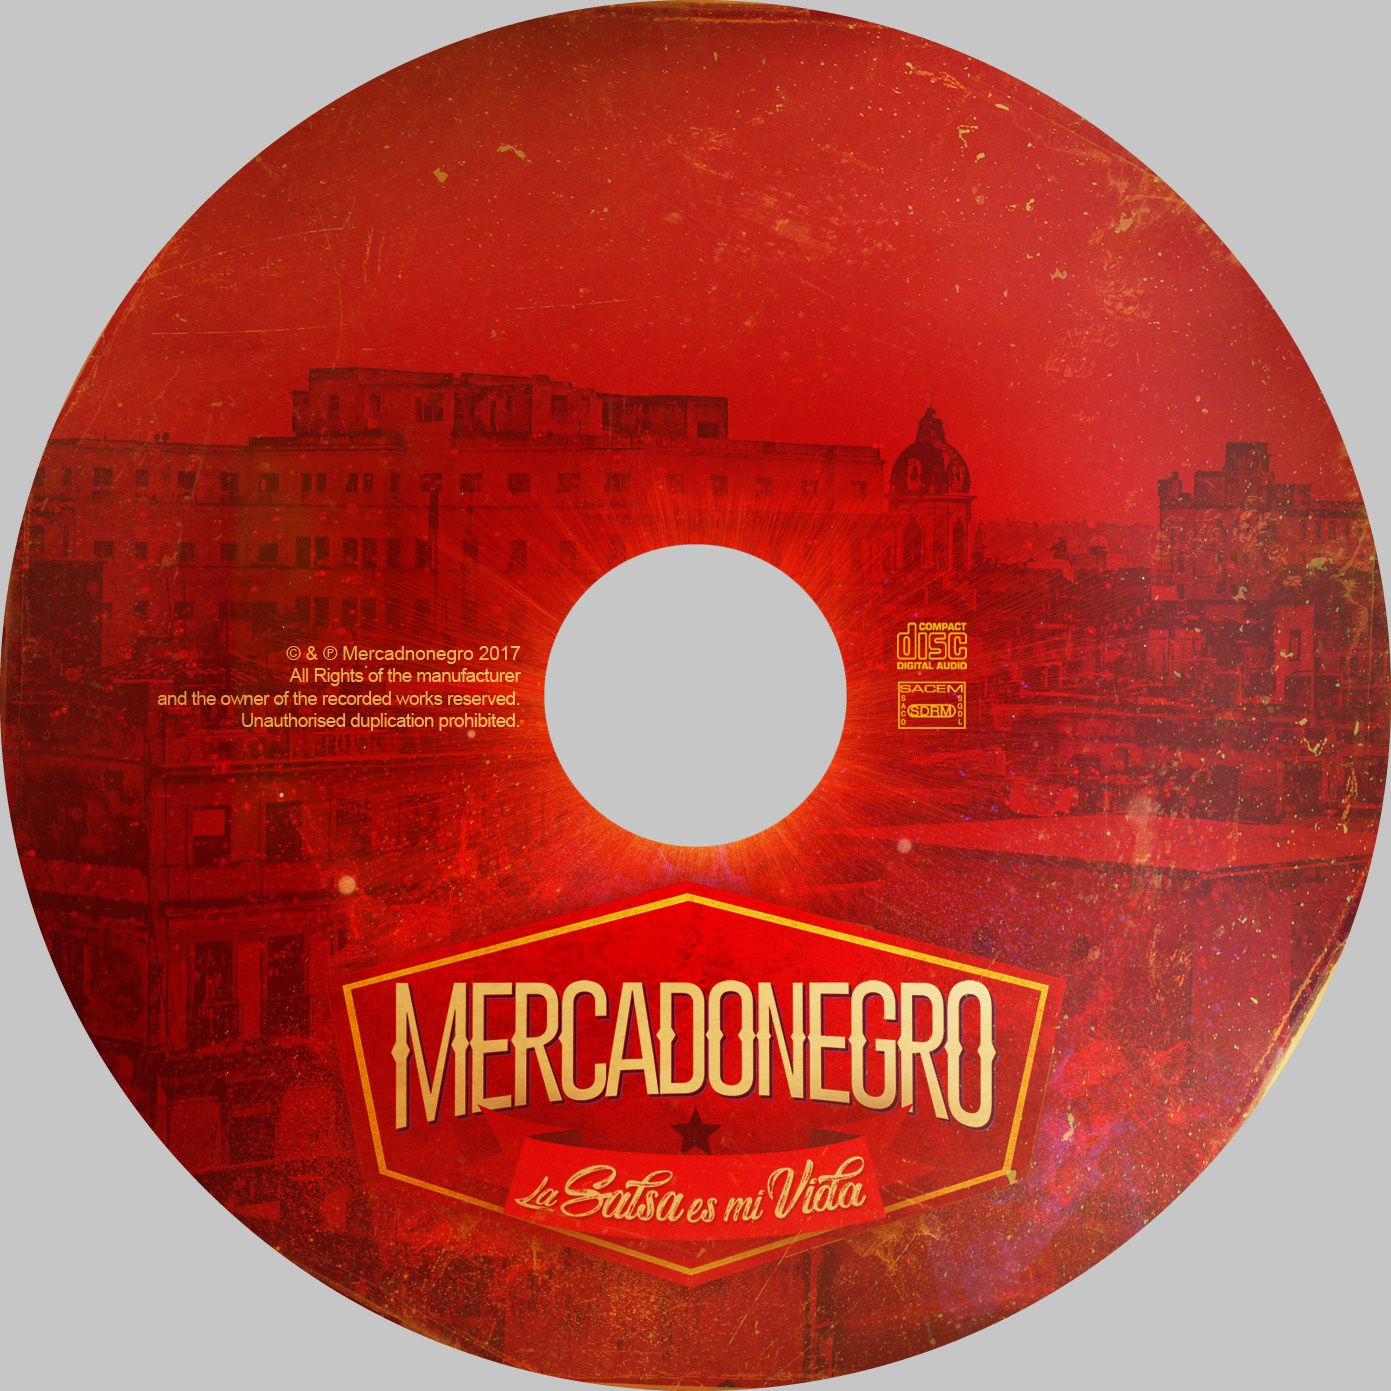 artwork album MERCADONEGRO